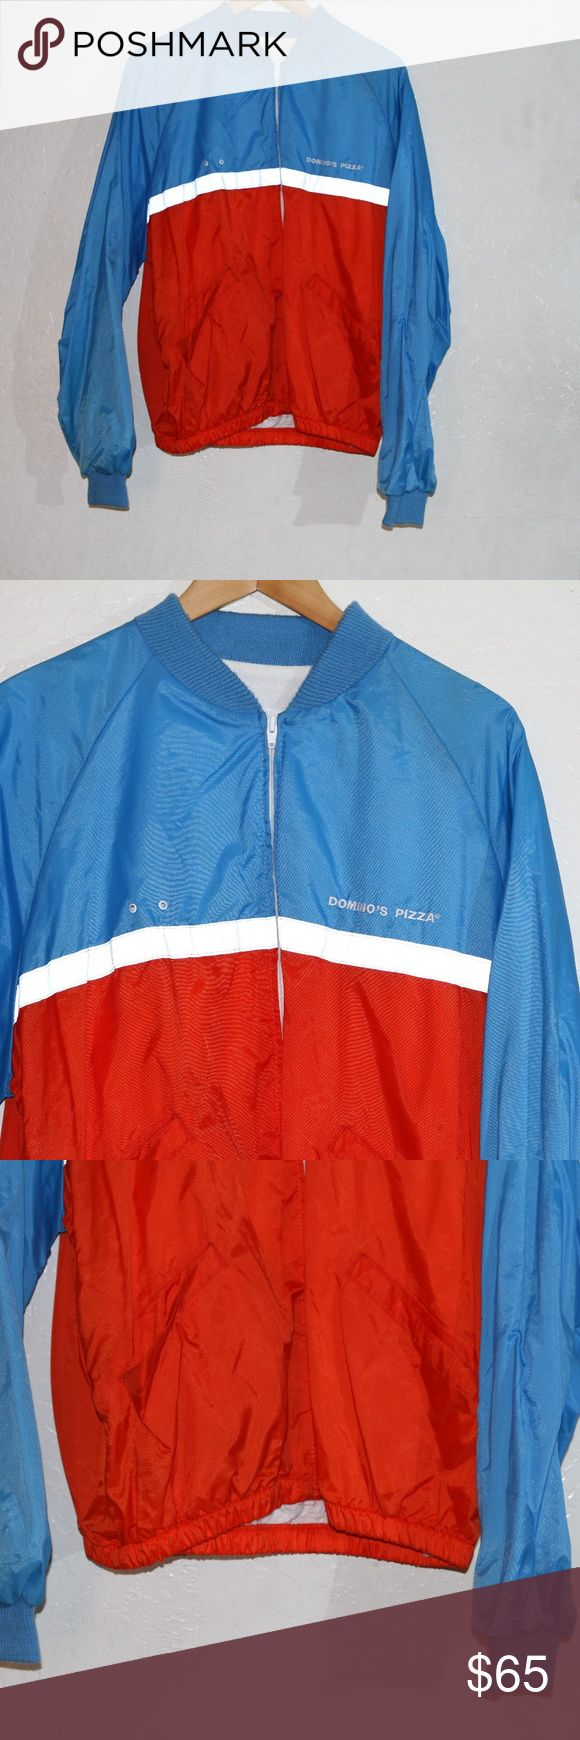 vintage 1980s dominos pizza jacket vintage 1980s dominos pizza jacket dominos Jackets & Coats